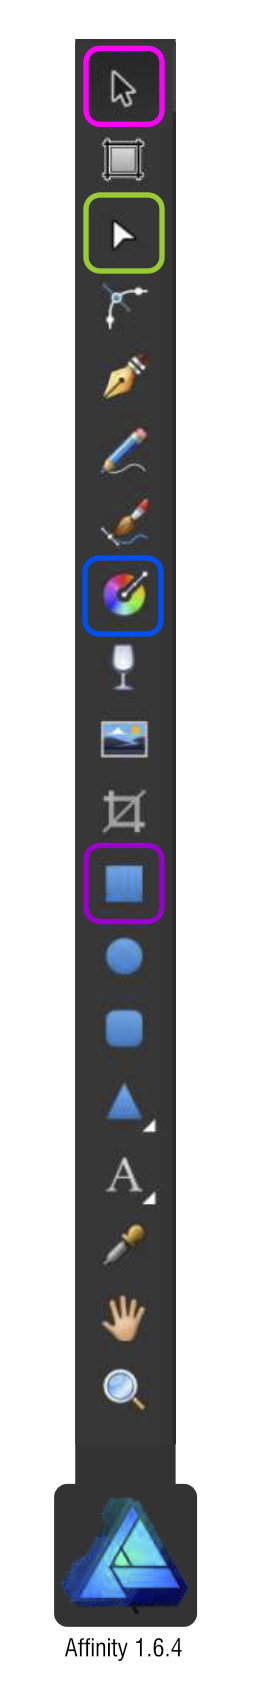 2Dgameartguru Affinity toolbar